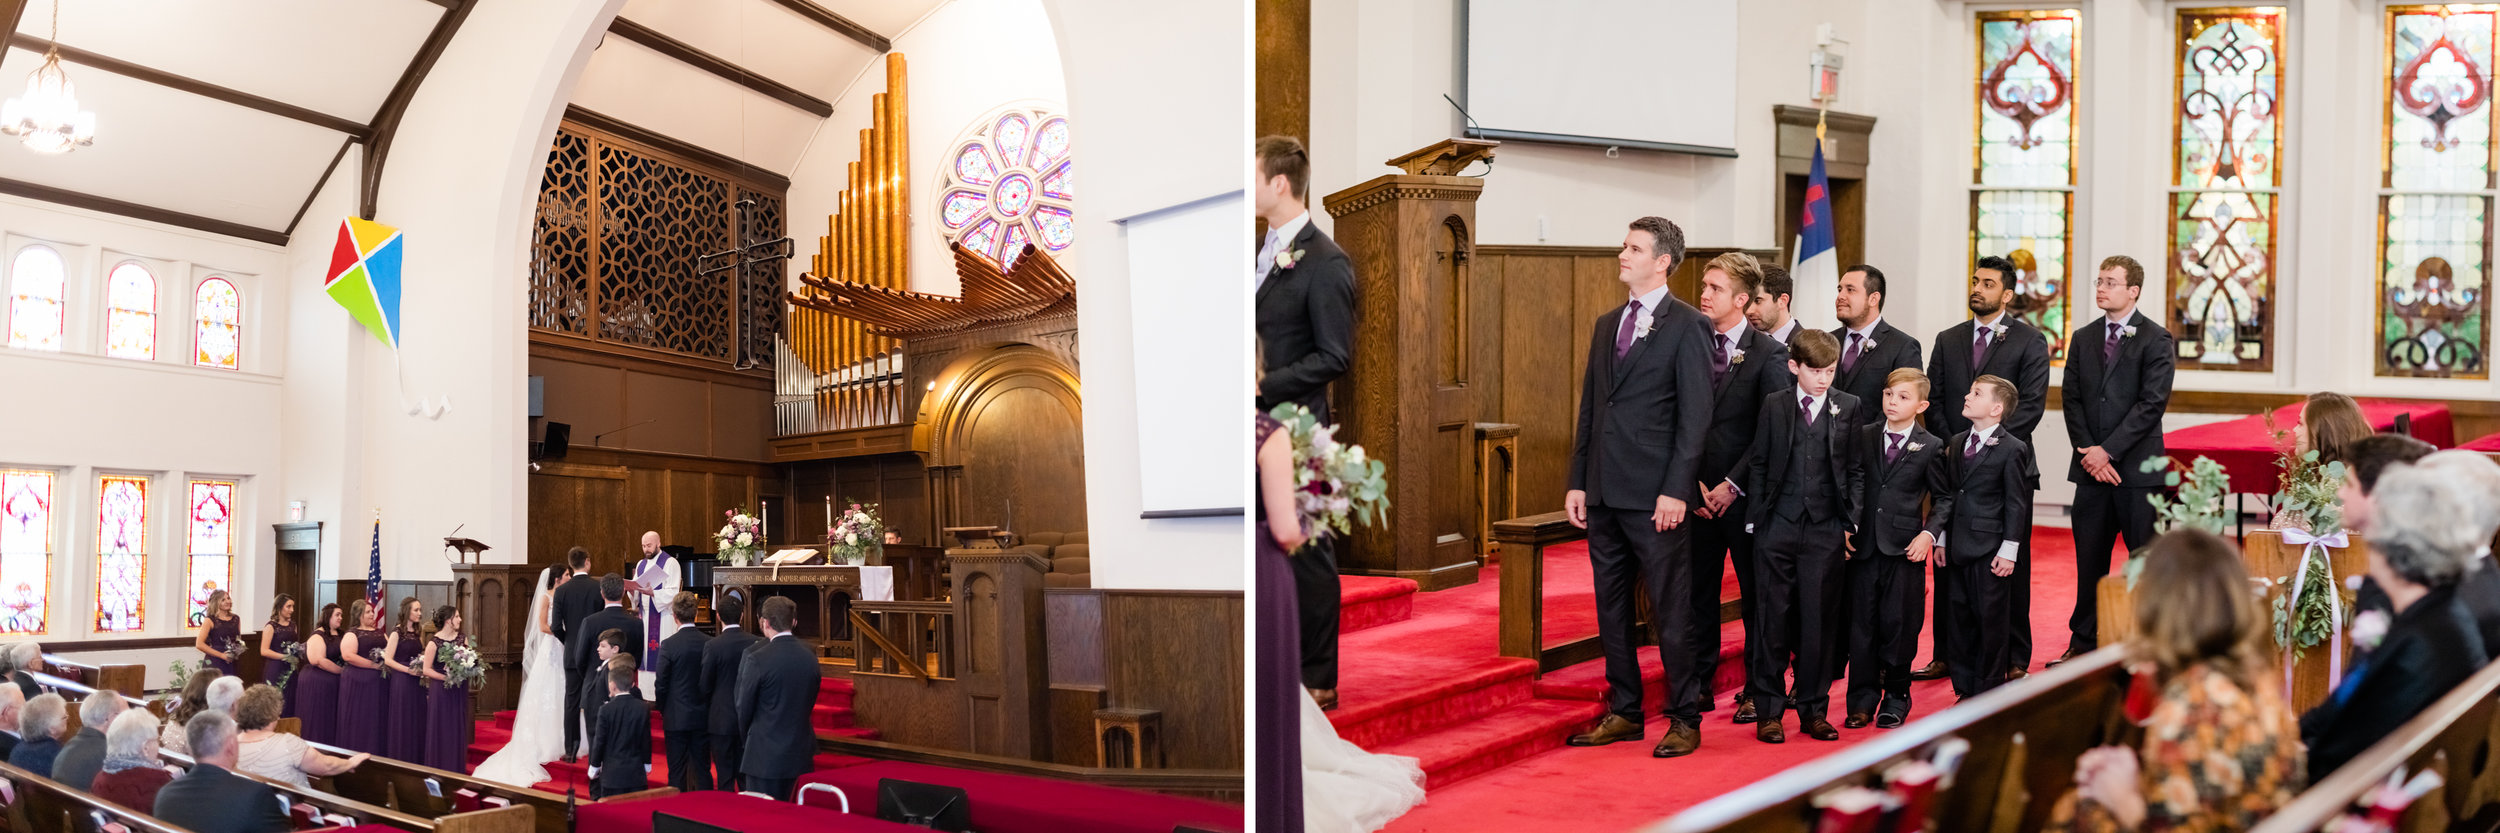 Kansas City wedding photographer3.jpg